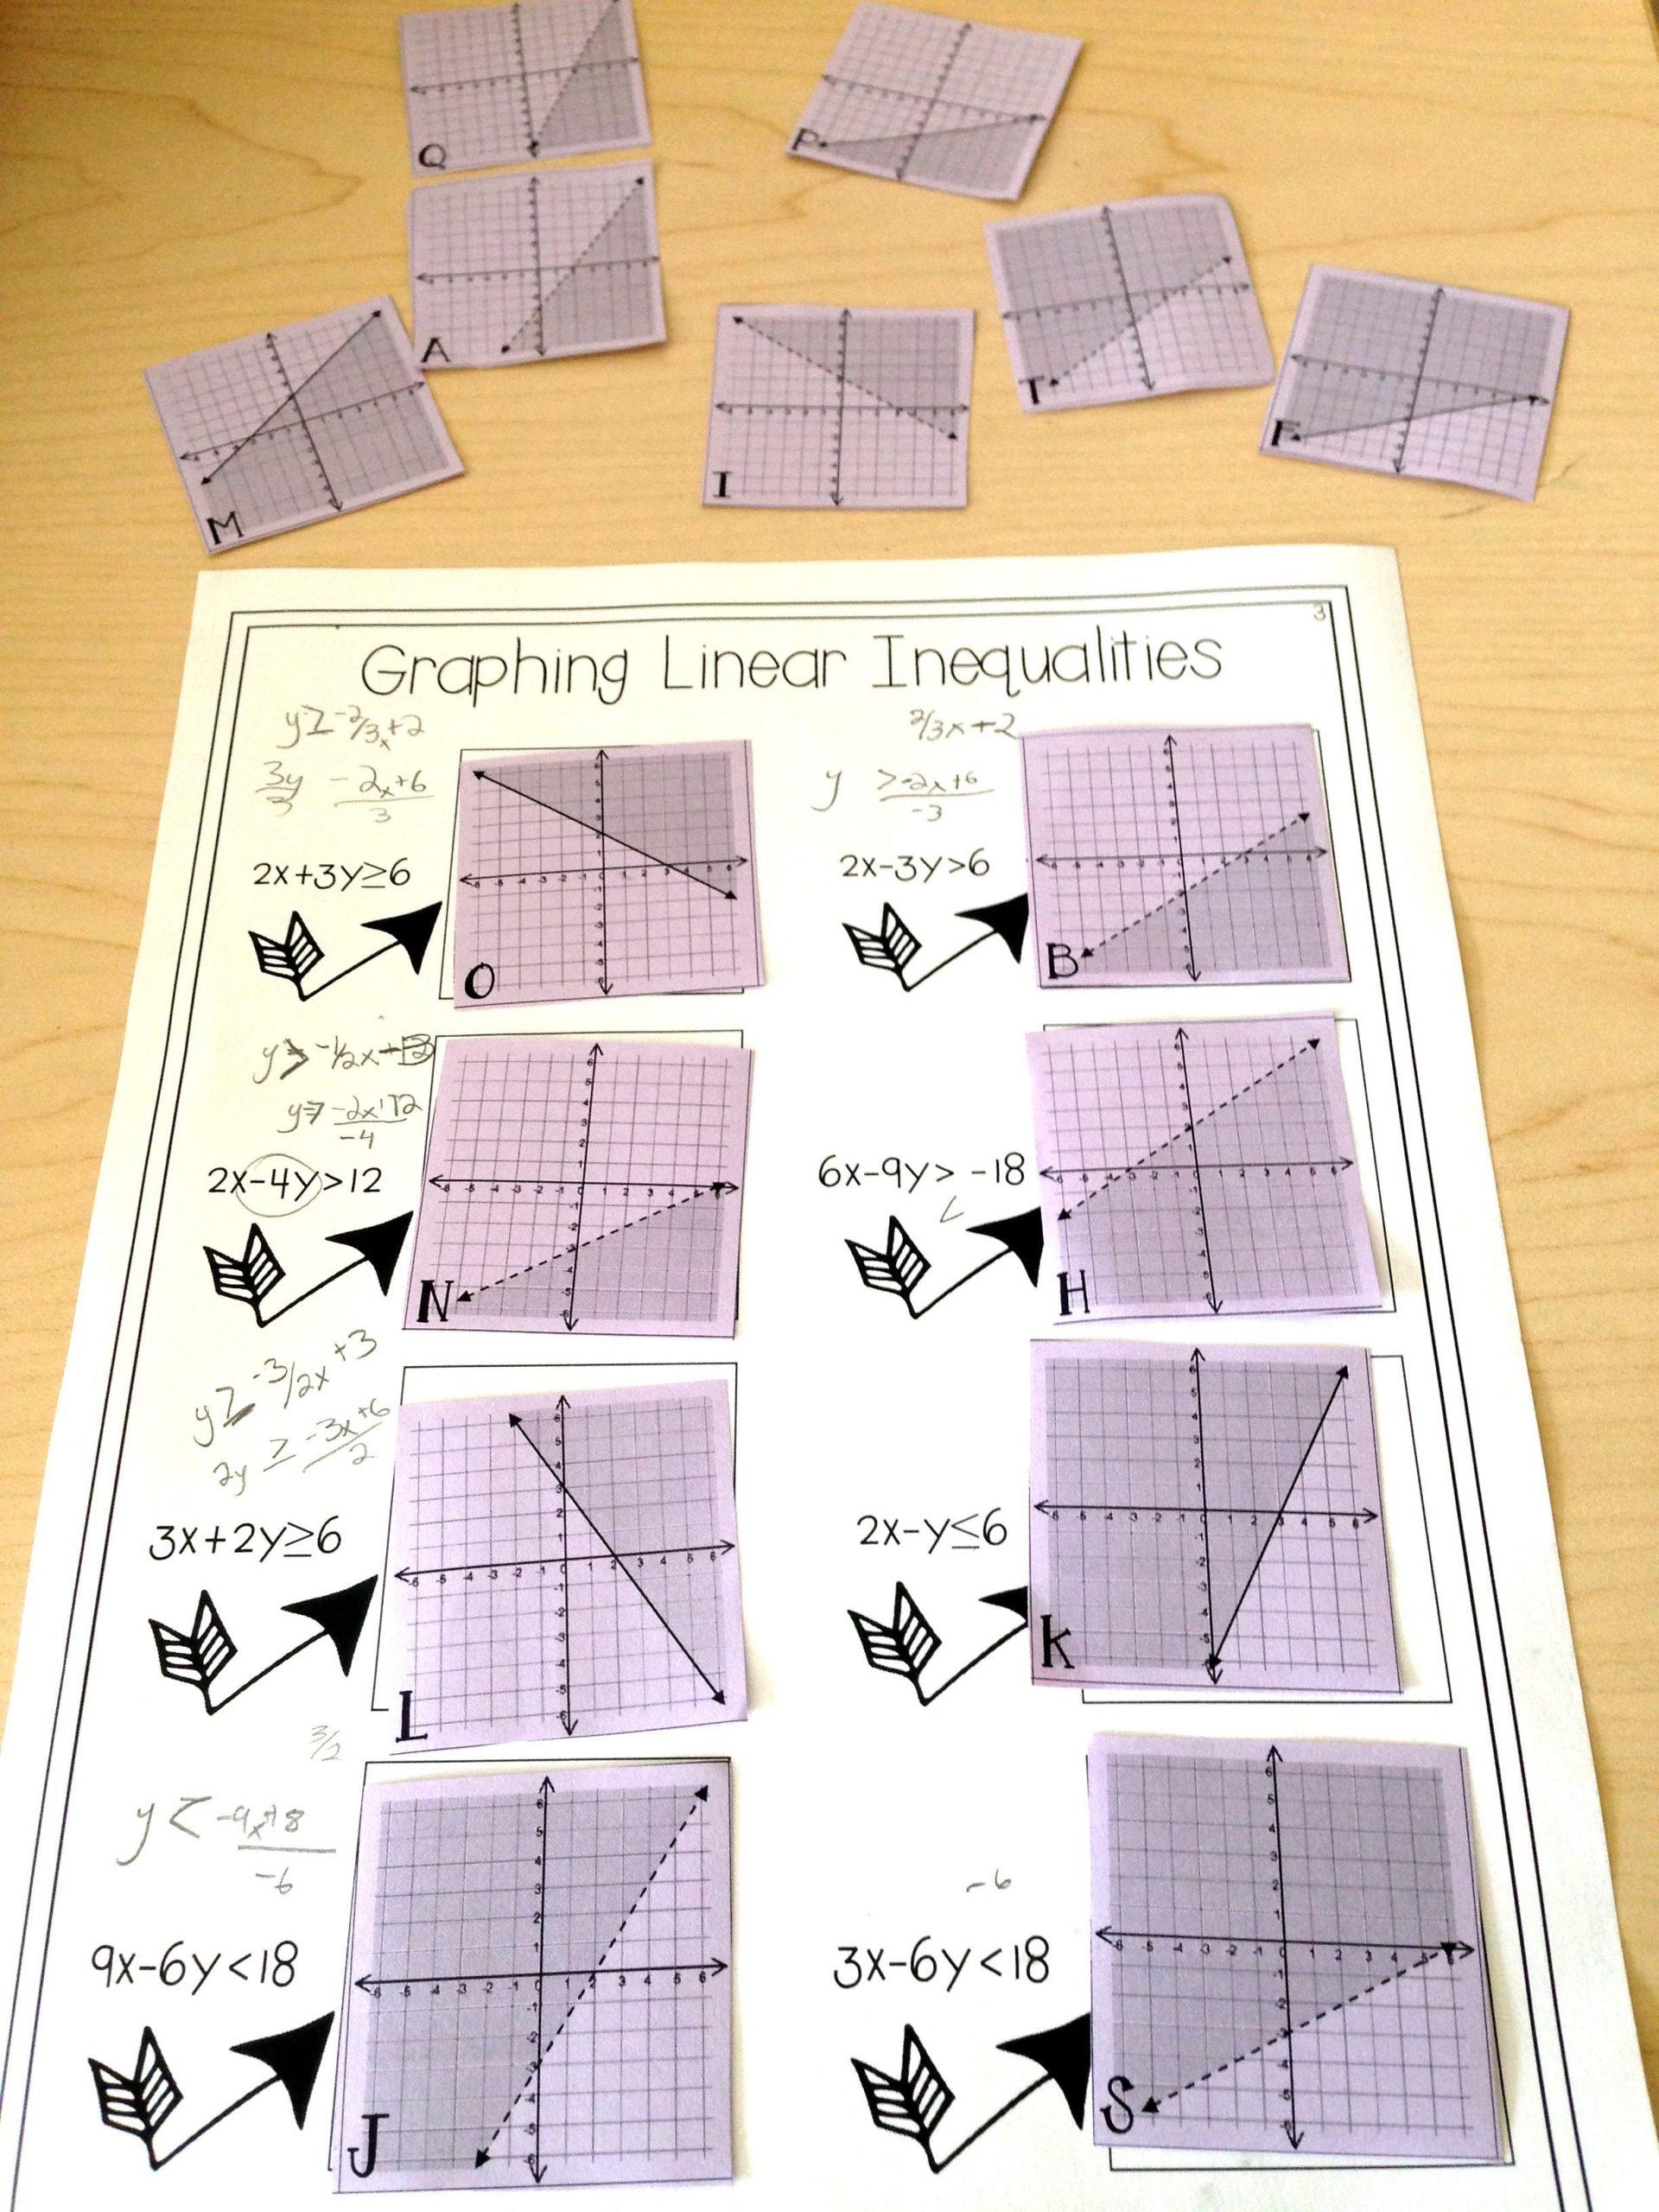 Graphing Linear Inequalities Worksheet Graphing Linear Inequalities Card Match Activity